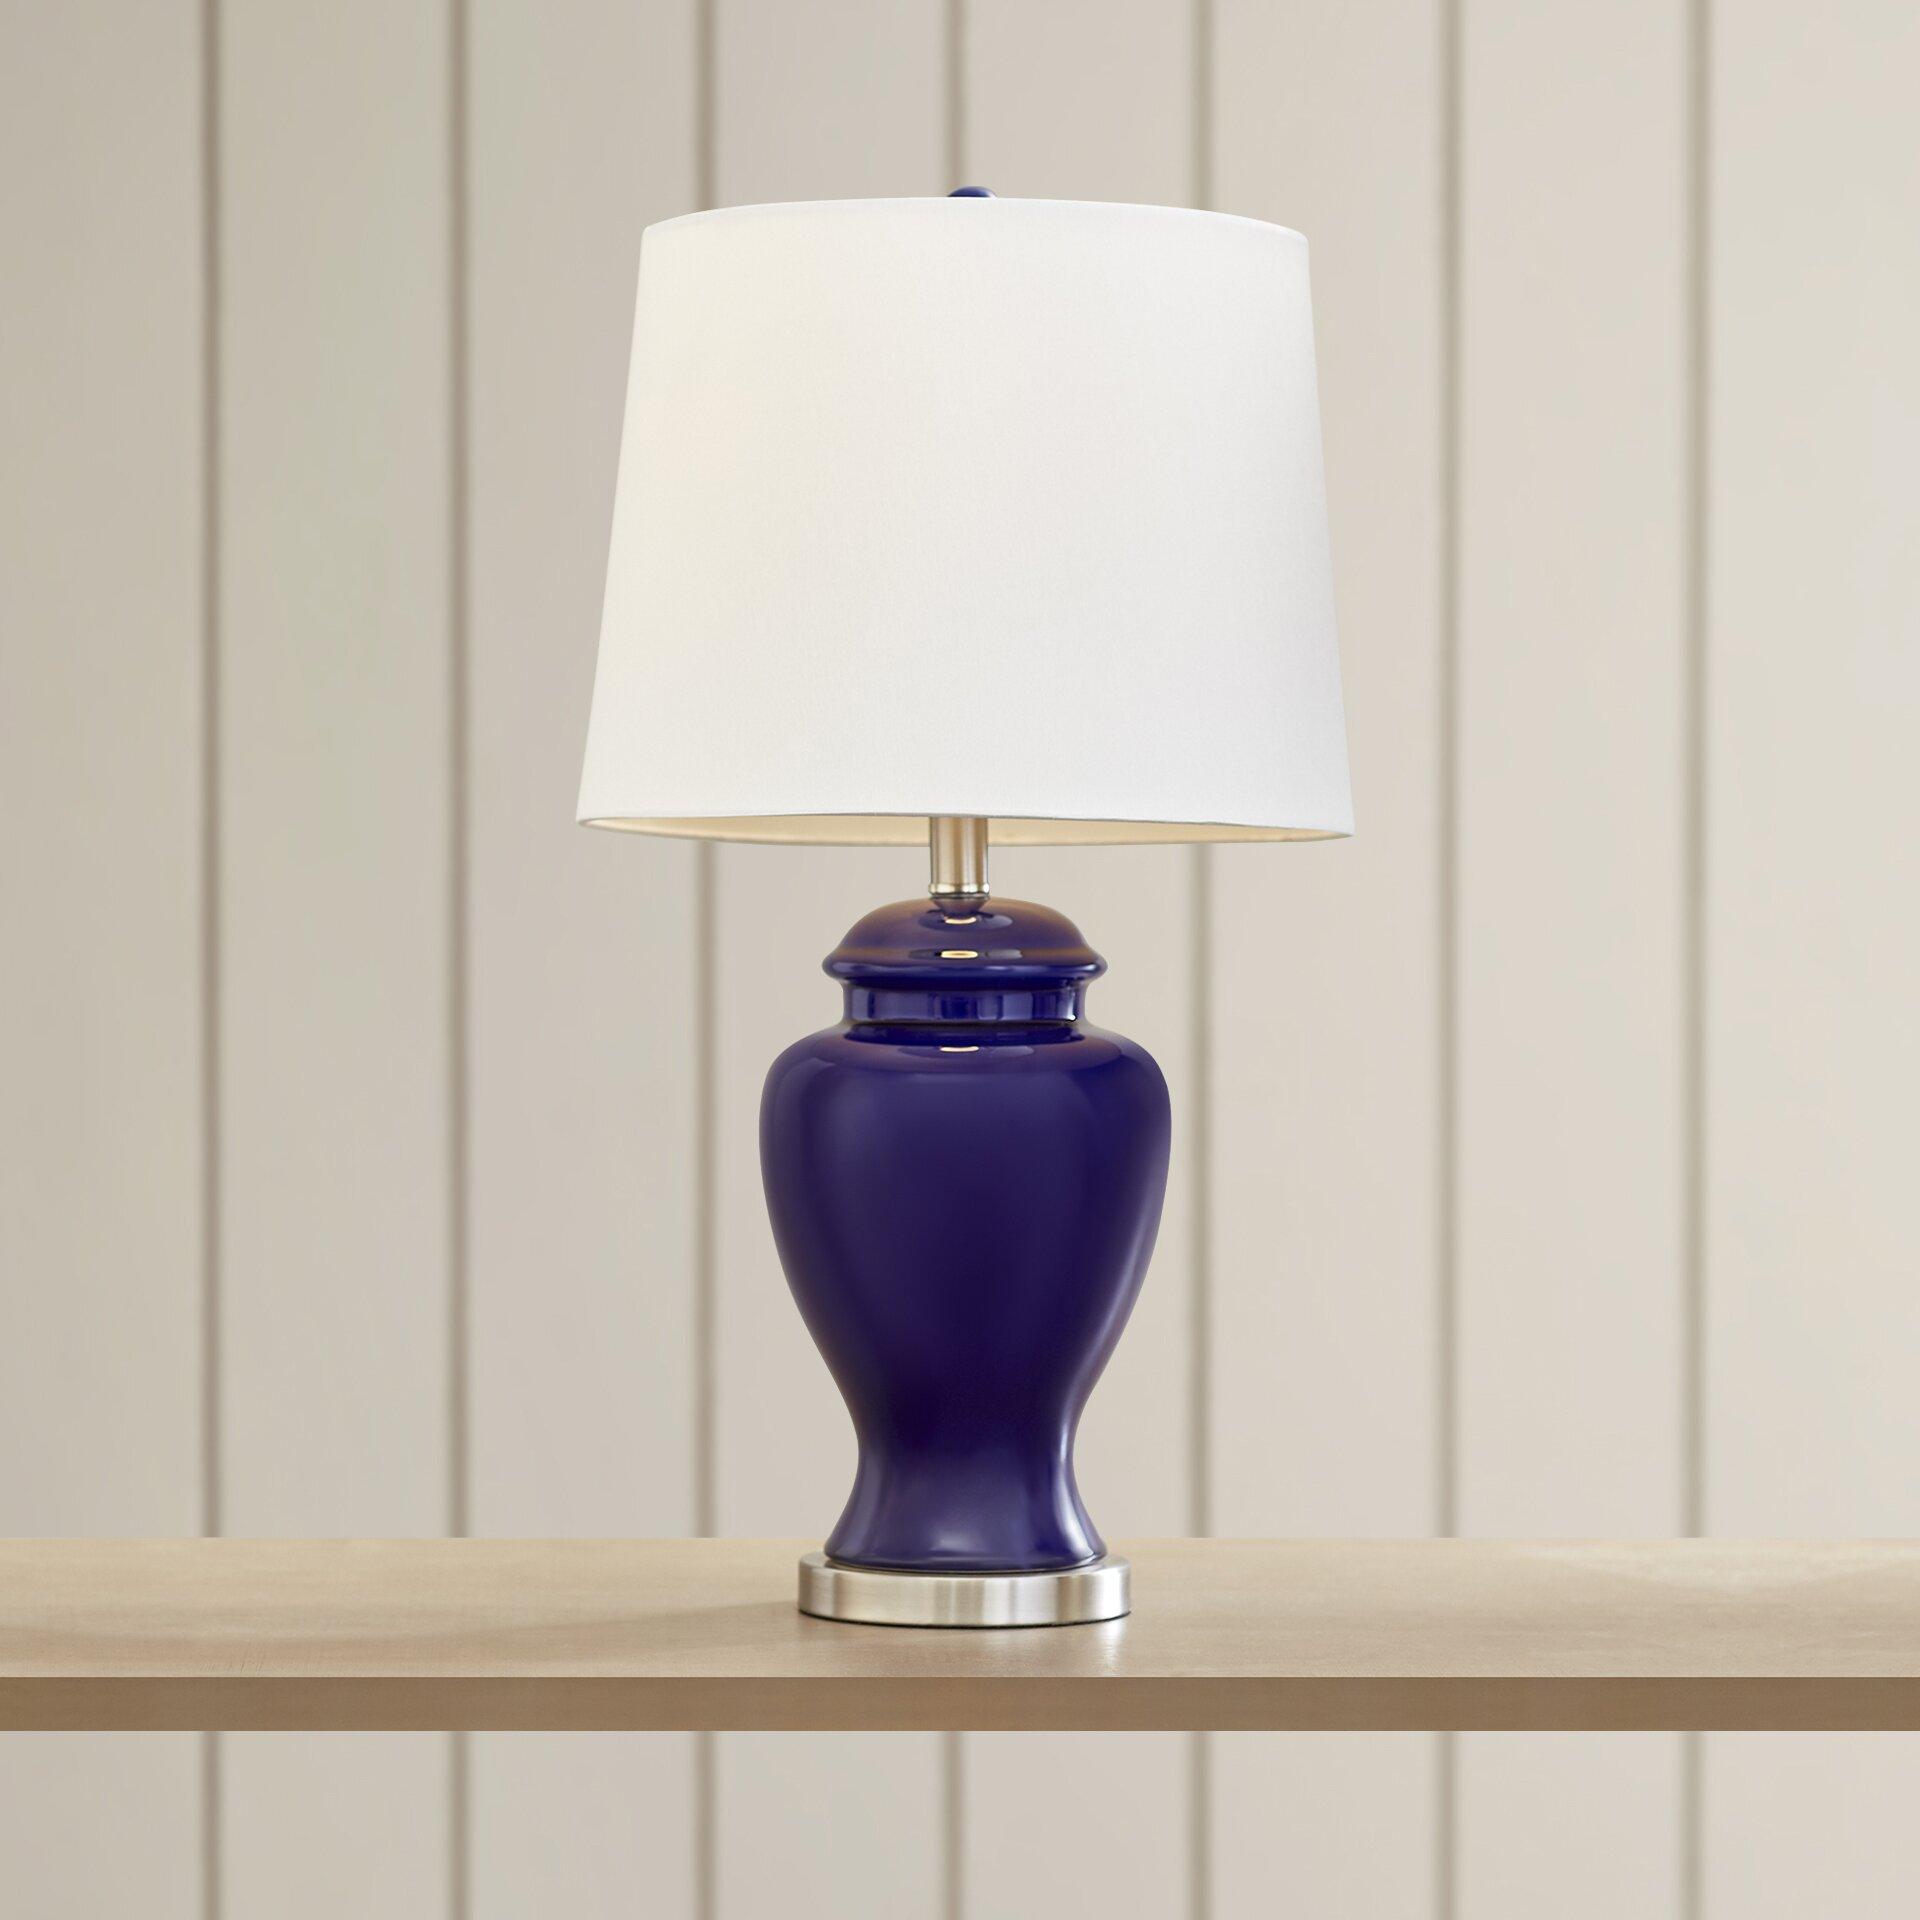 breakwater bay staytonville 24 table lamp reviews wayfair. Black Bedroom Furniture Sets. Home Design Ideas